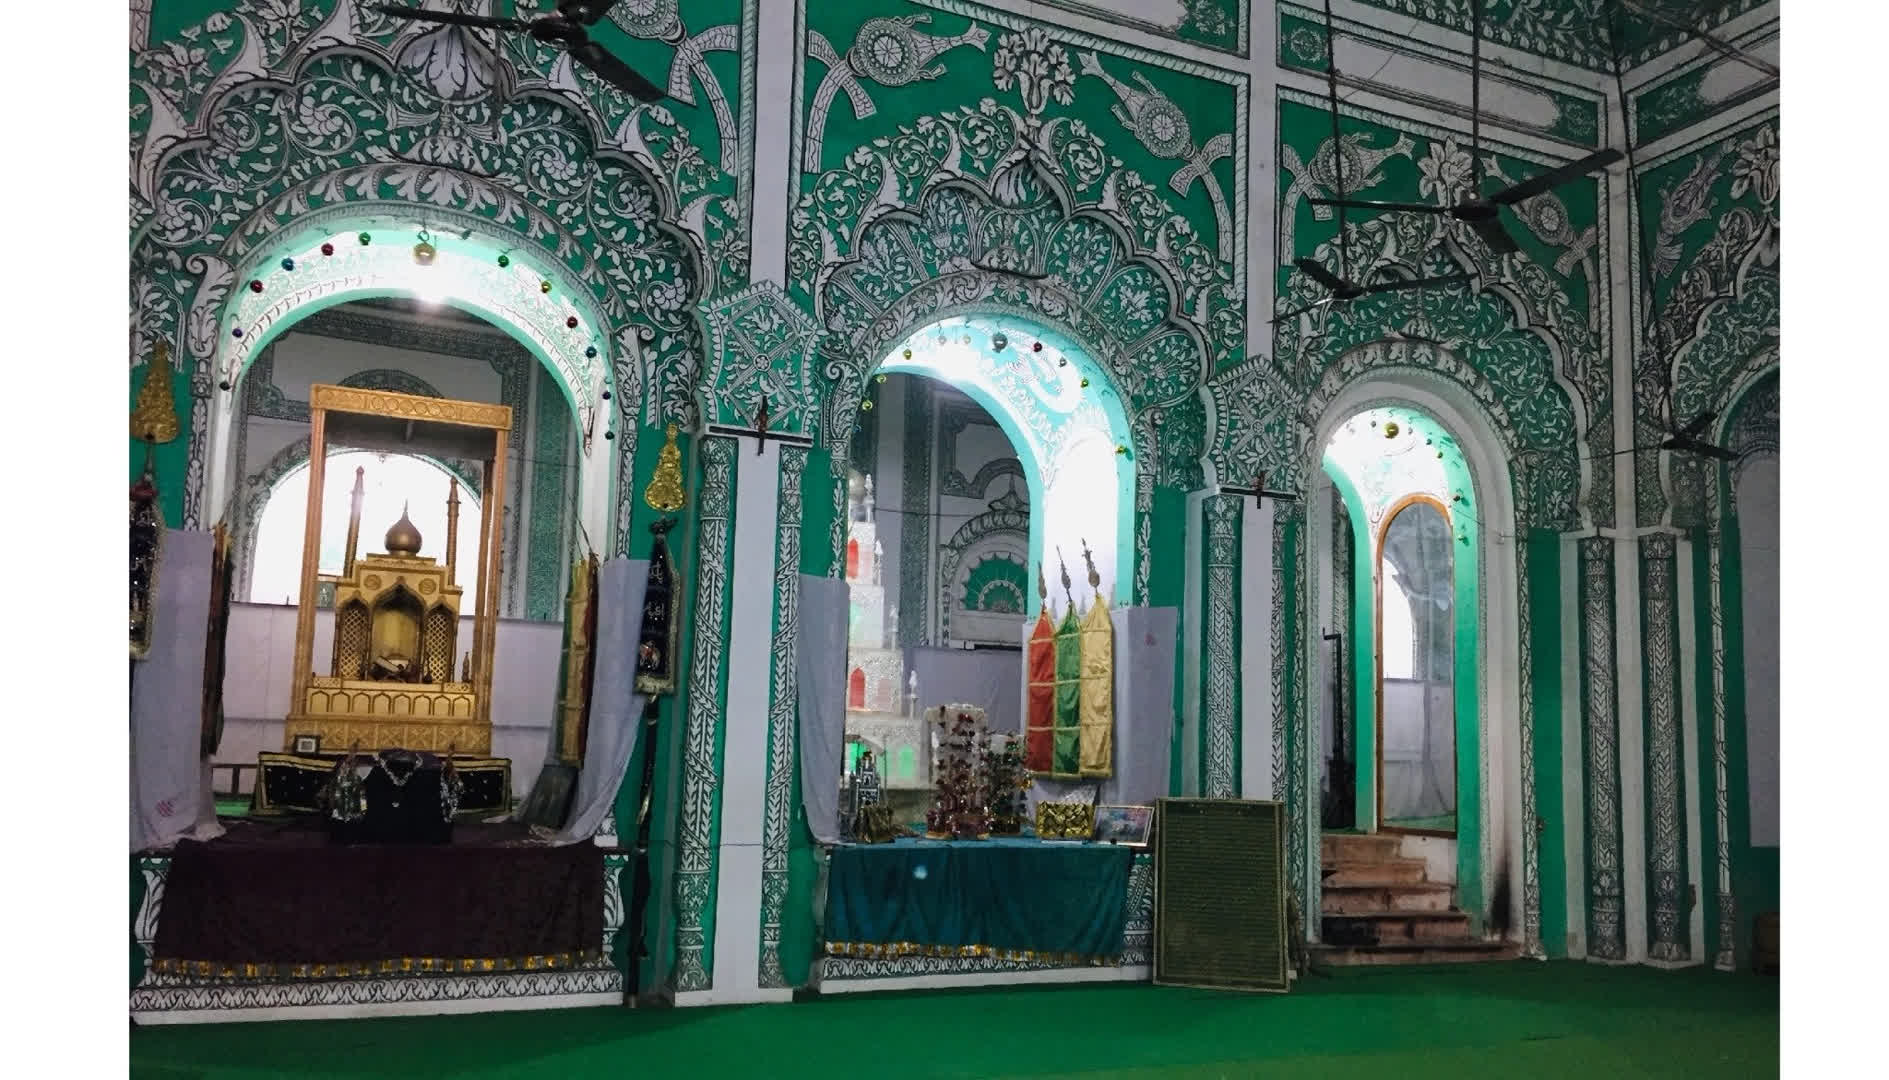 Sibtainabad Imambara from the inside